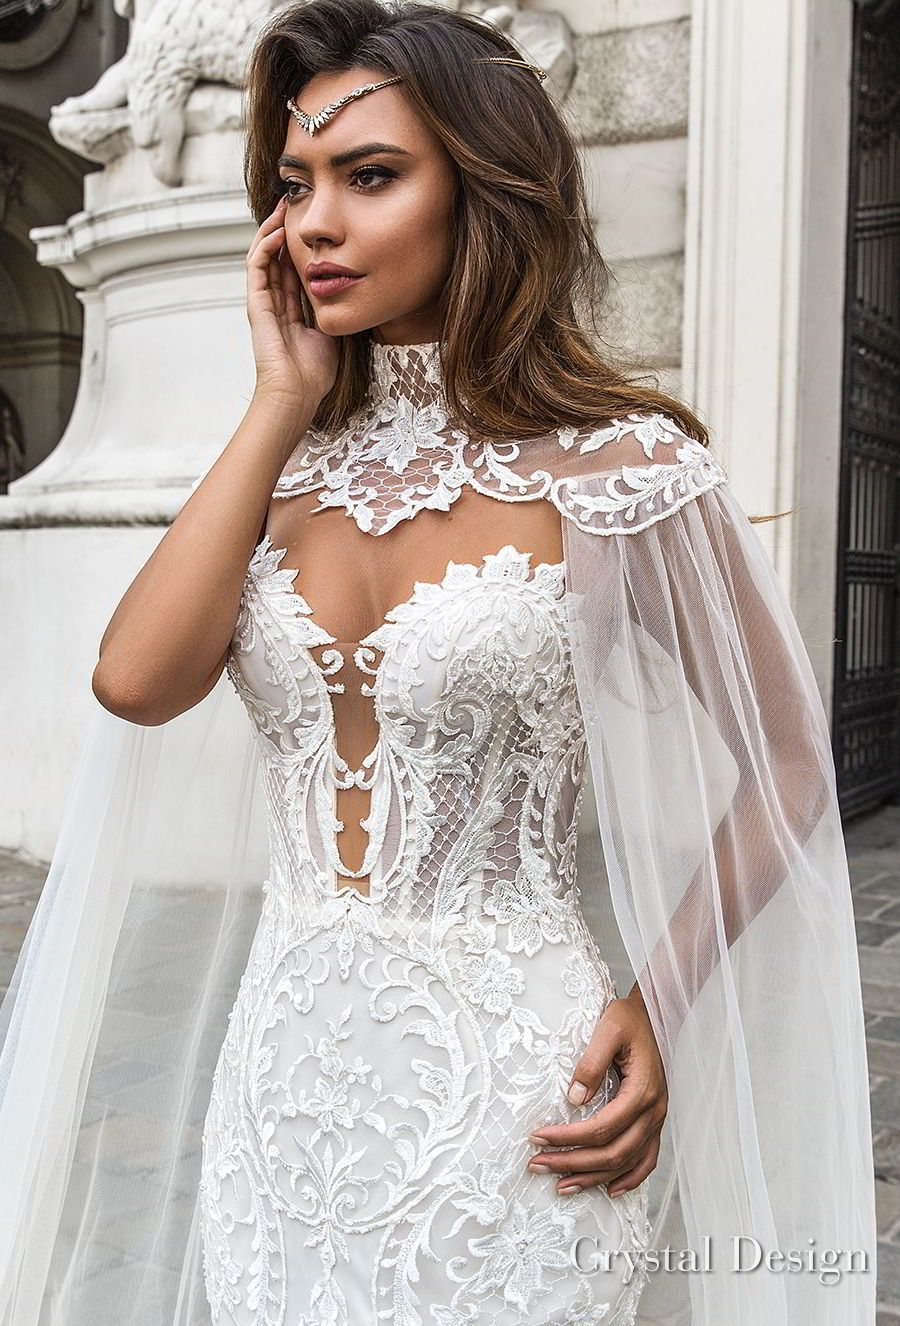 Elegant mermaid wedding dresses  crystal design  sleeveless strapless deep plunging sweetheart